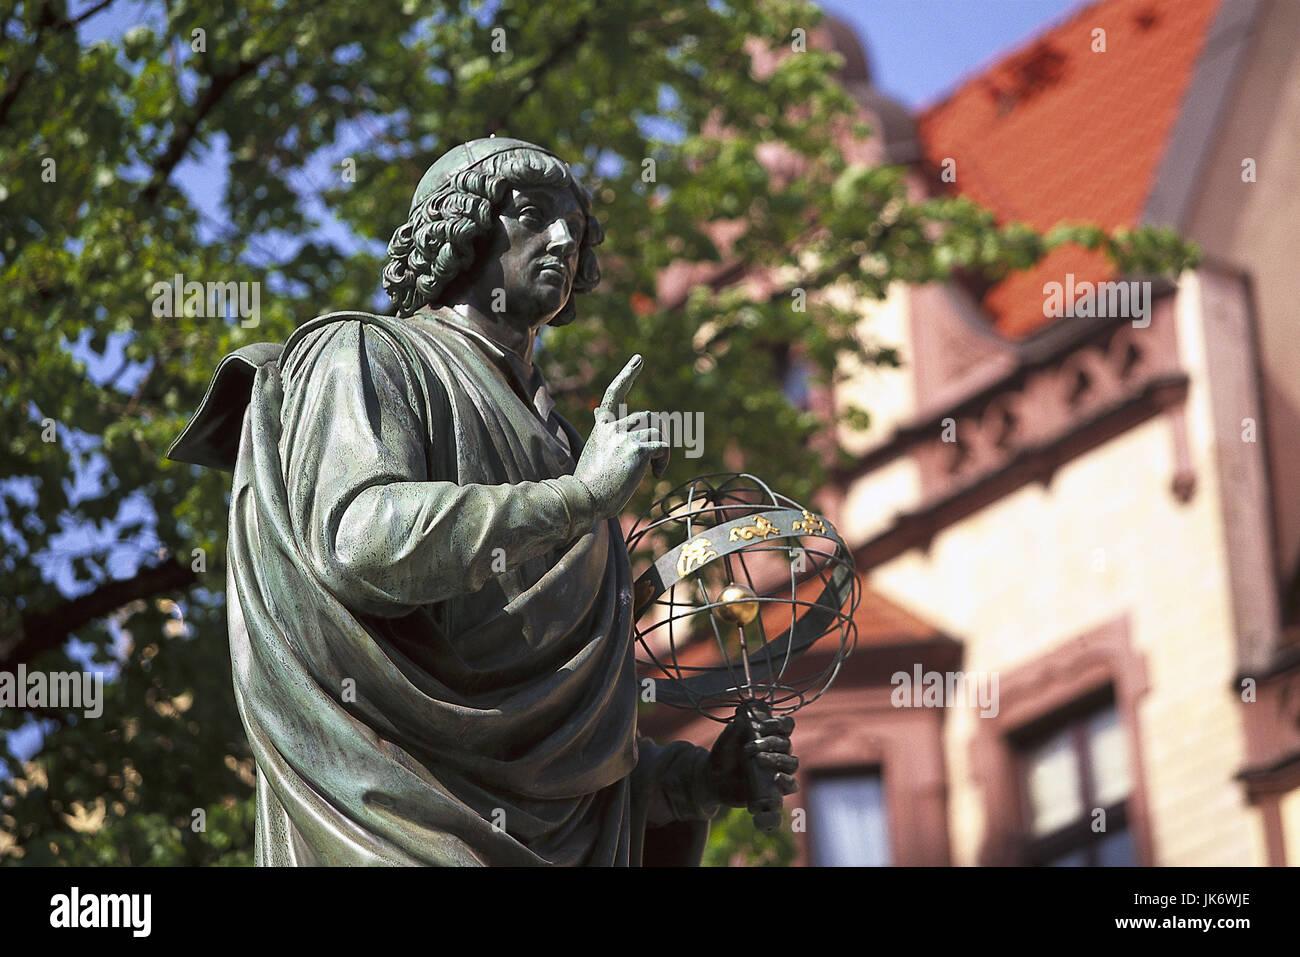 Polen, Kujawien-Pommern, Torun,  Rynek Starmojeski Platz,  Kopernicus-Statue Europa, Osteuropa, Rzeczpospolita Polska, - Stock Image